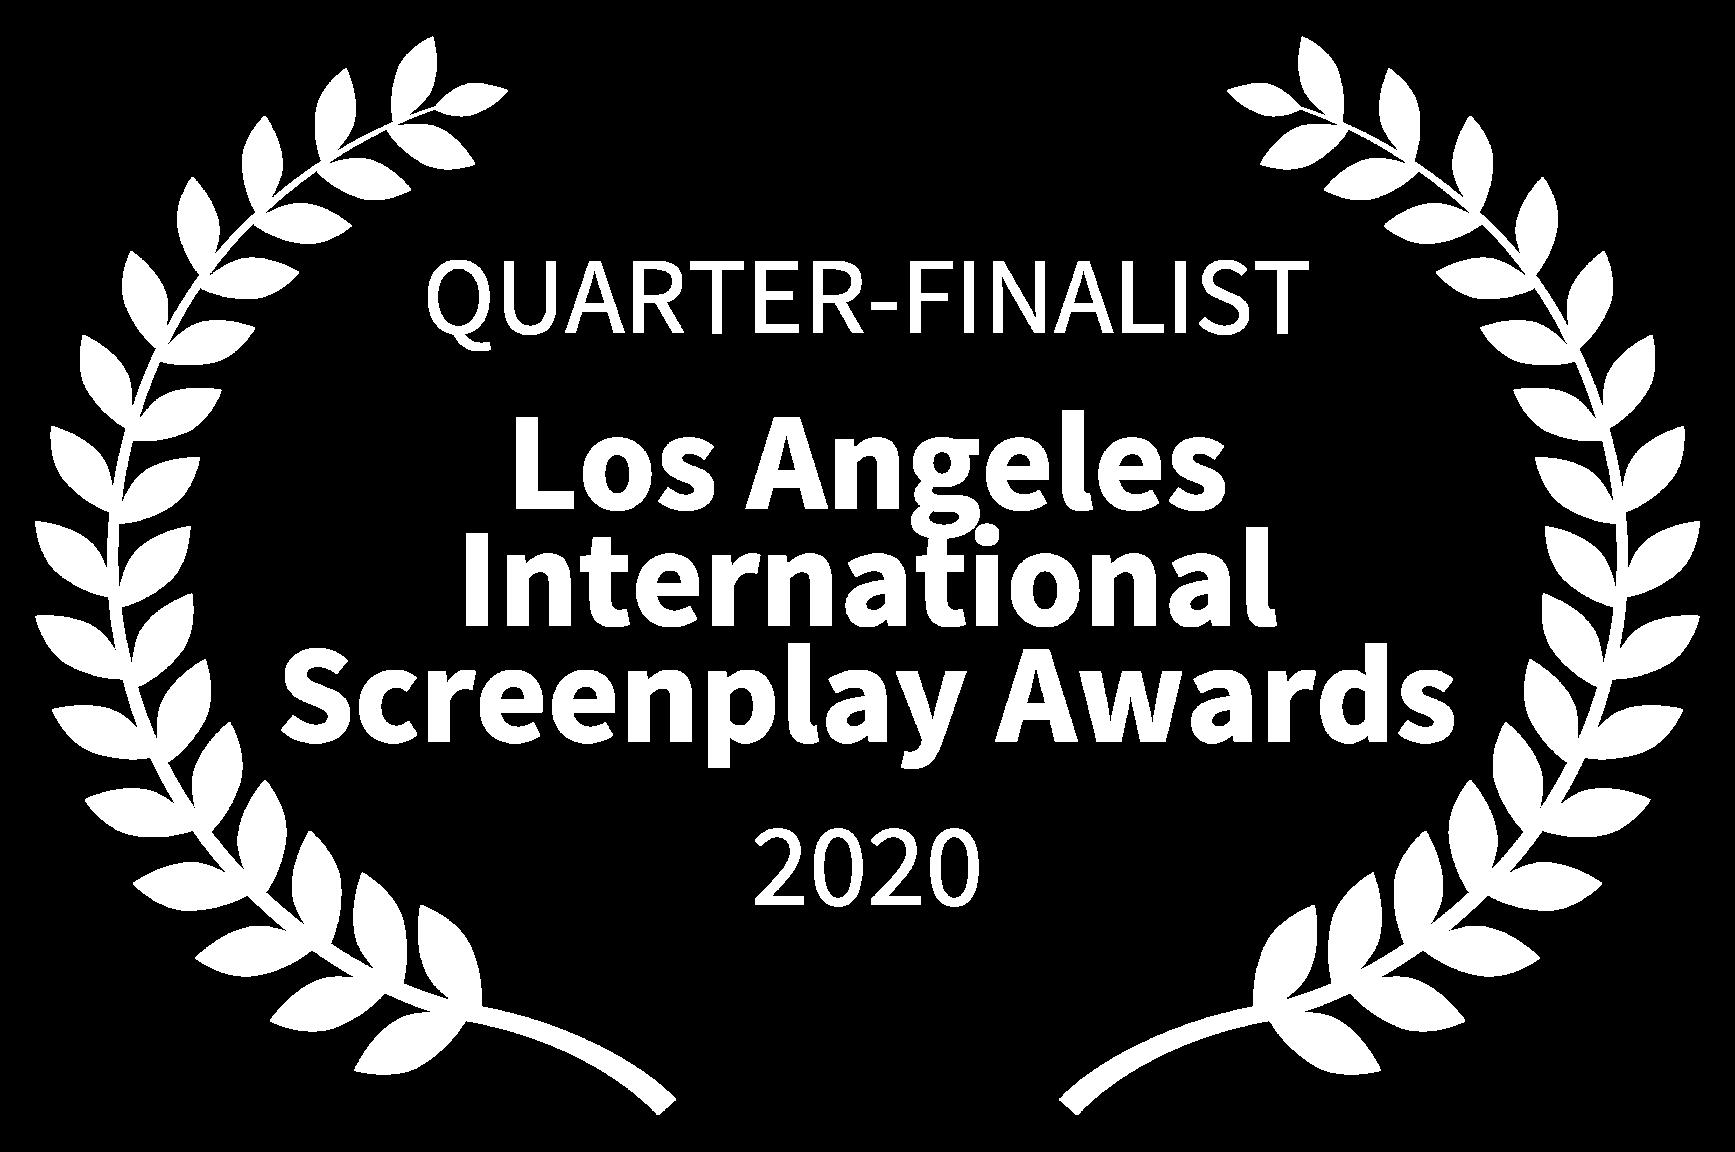 QUARTER-FINALIST - Los Angeles International Screenplay Awards - 2020